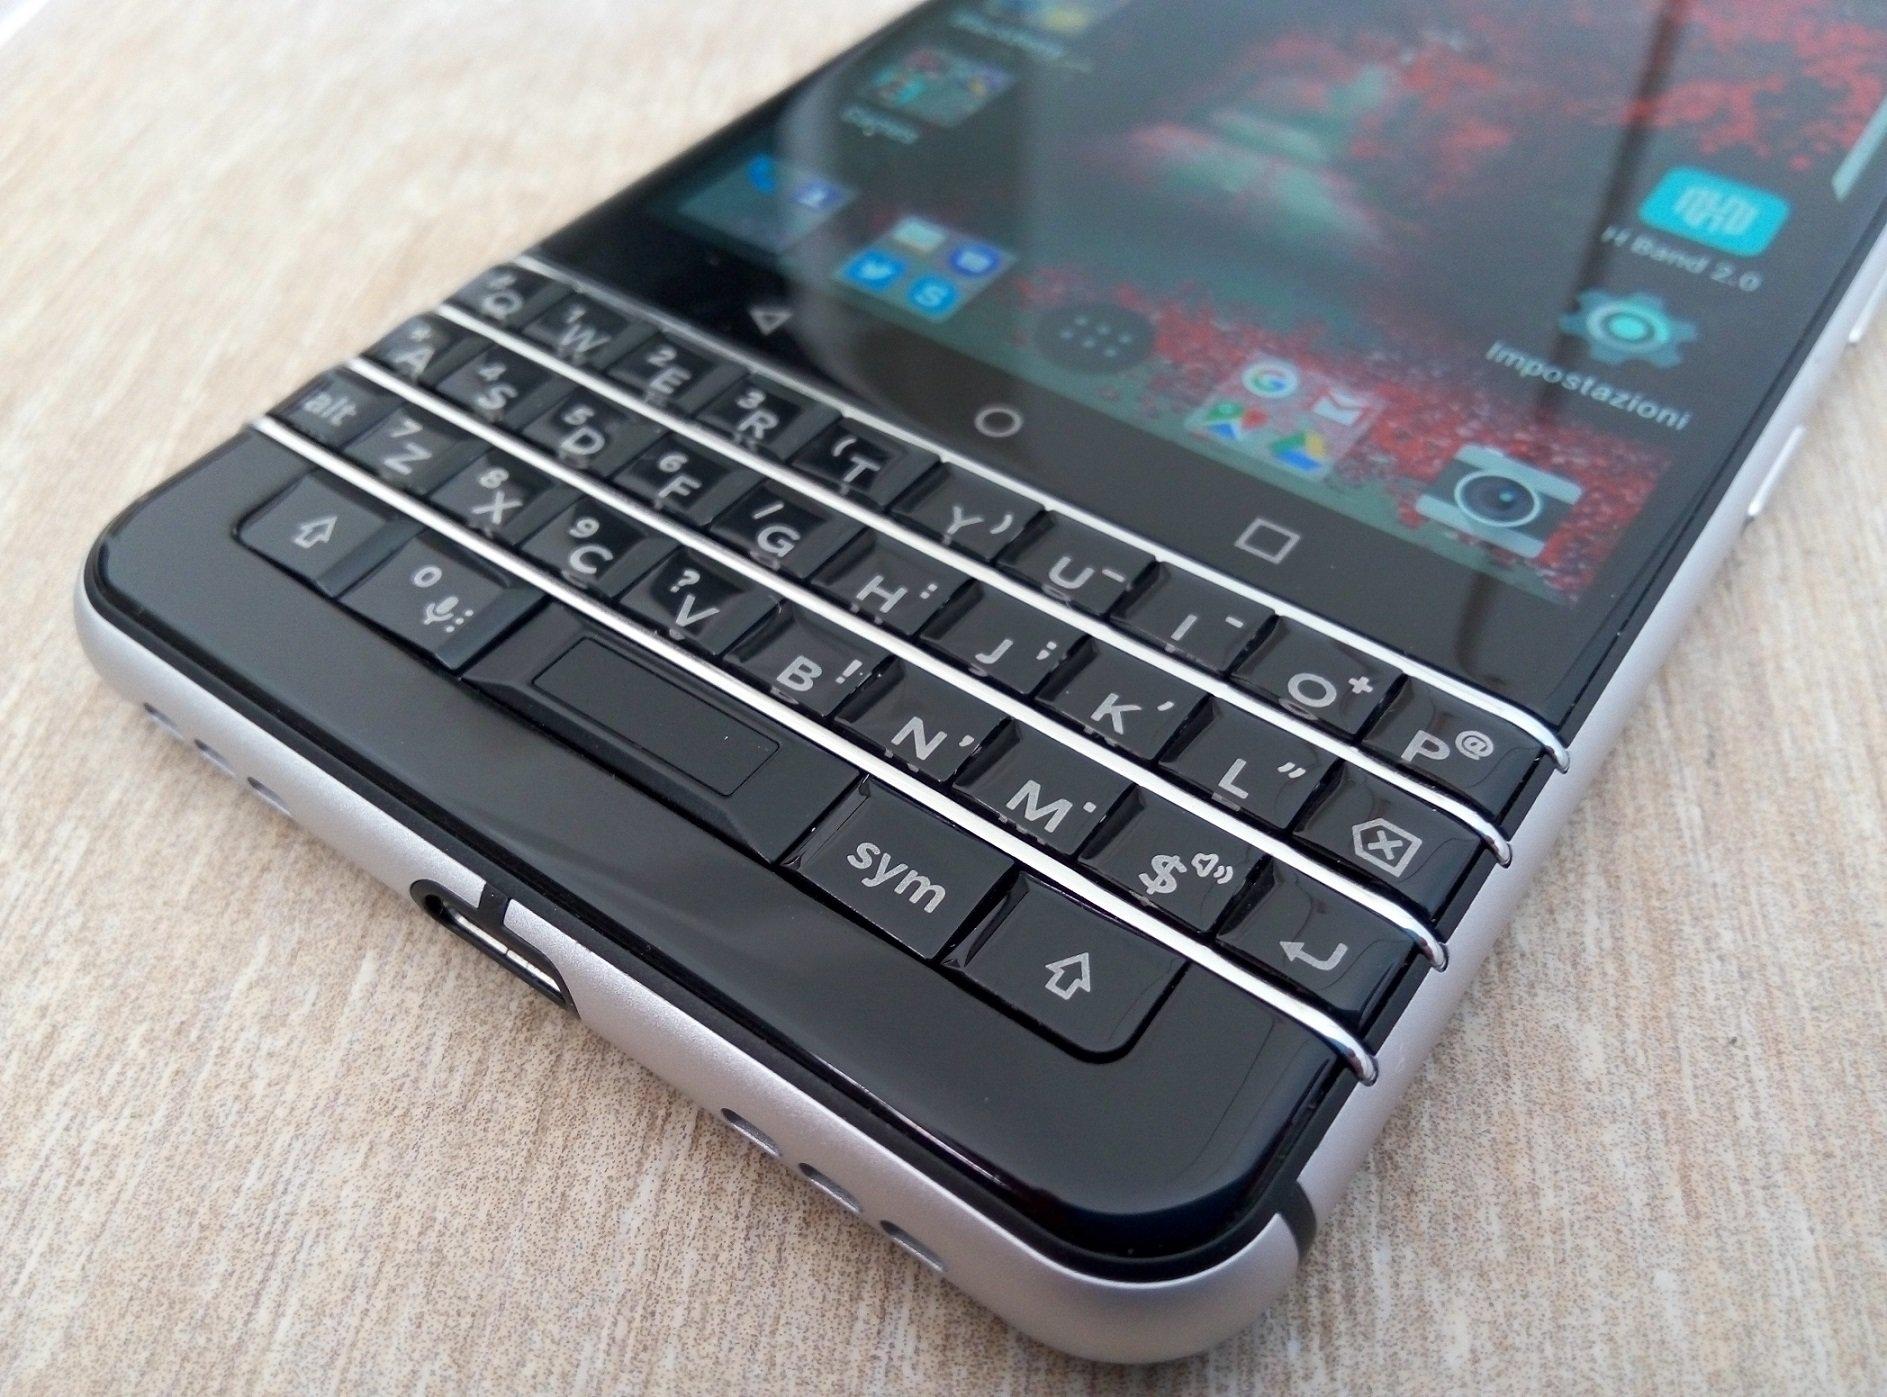 blackberry keyone recensione lo smartphone android con